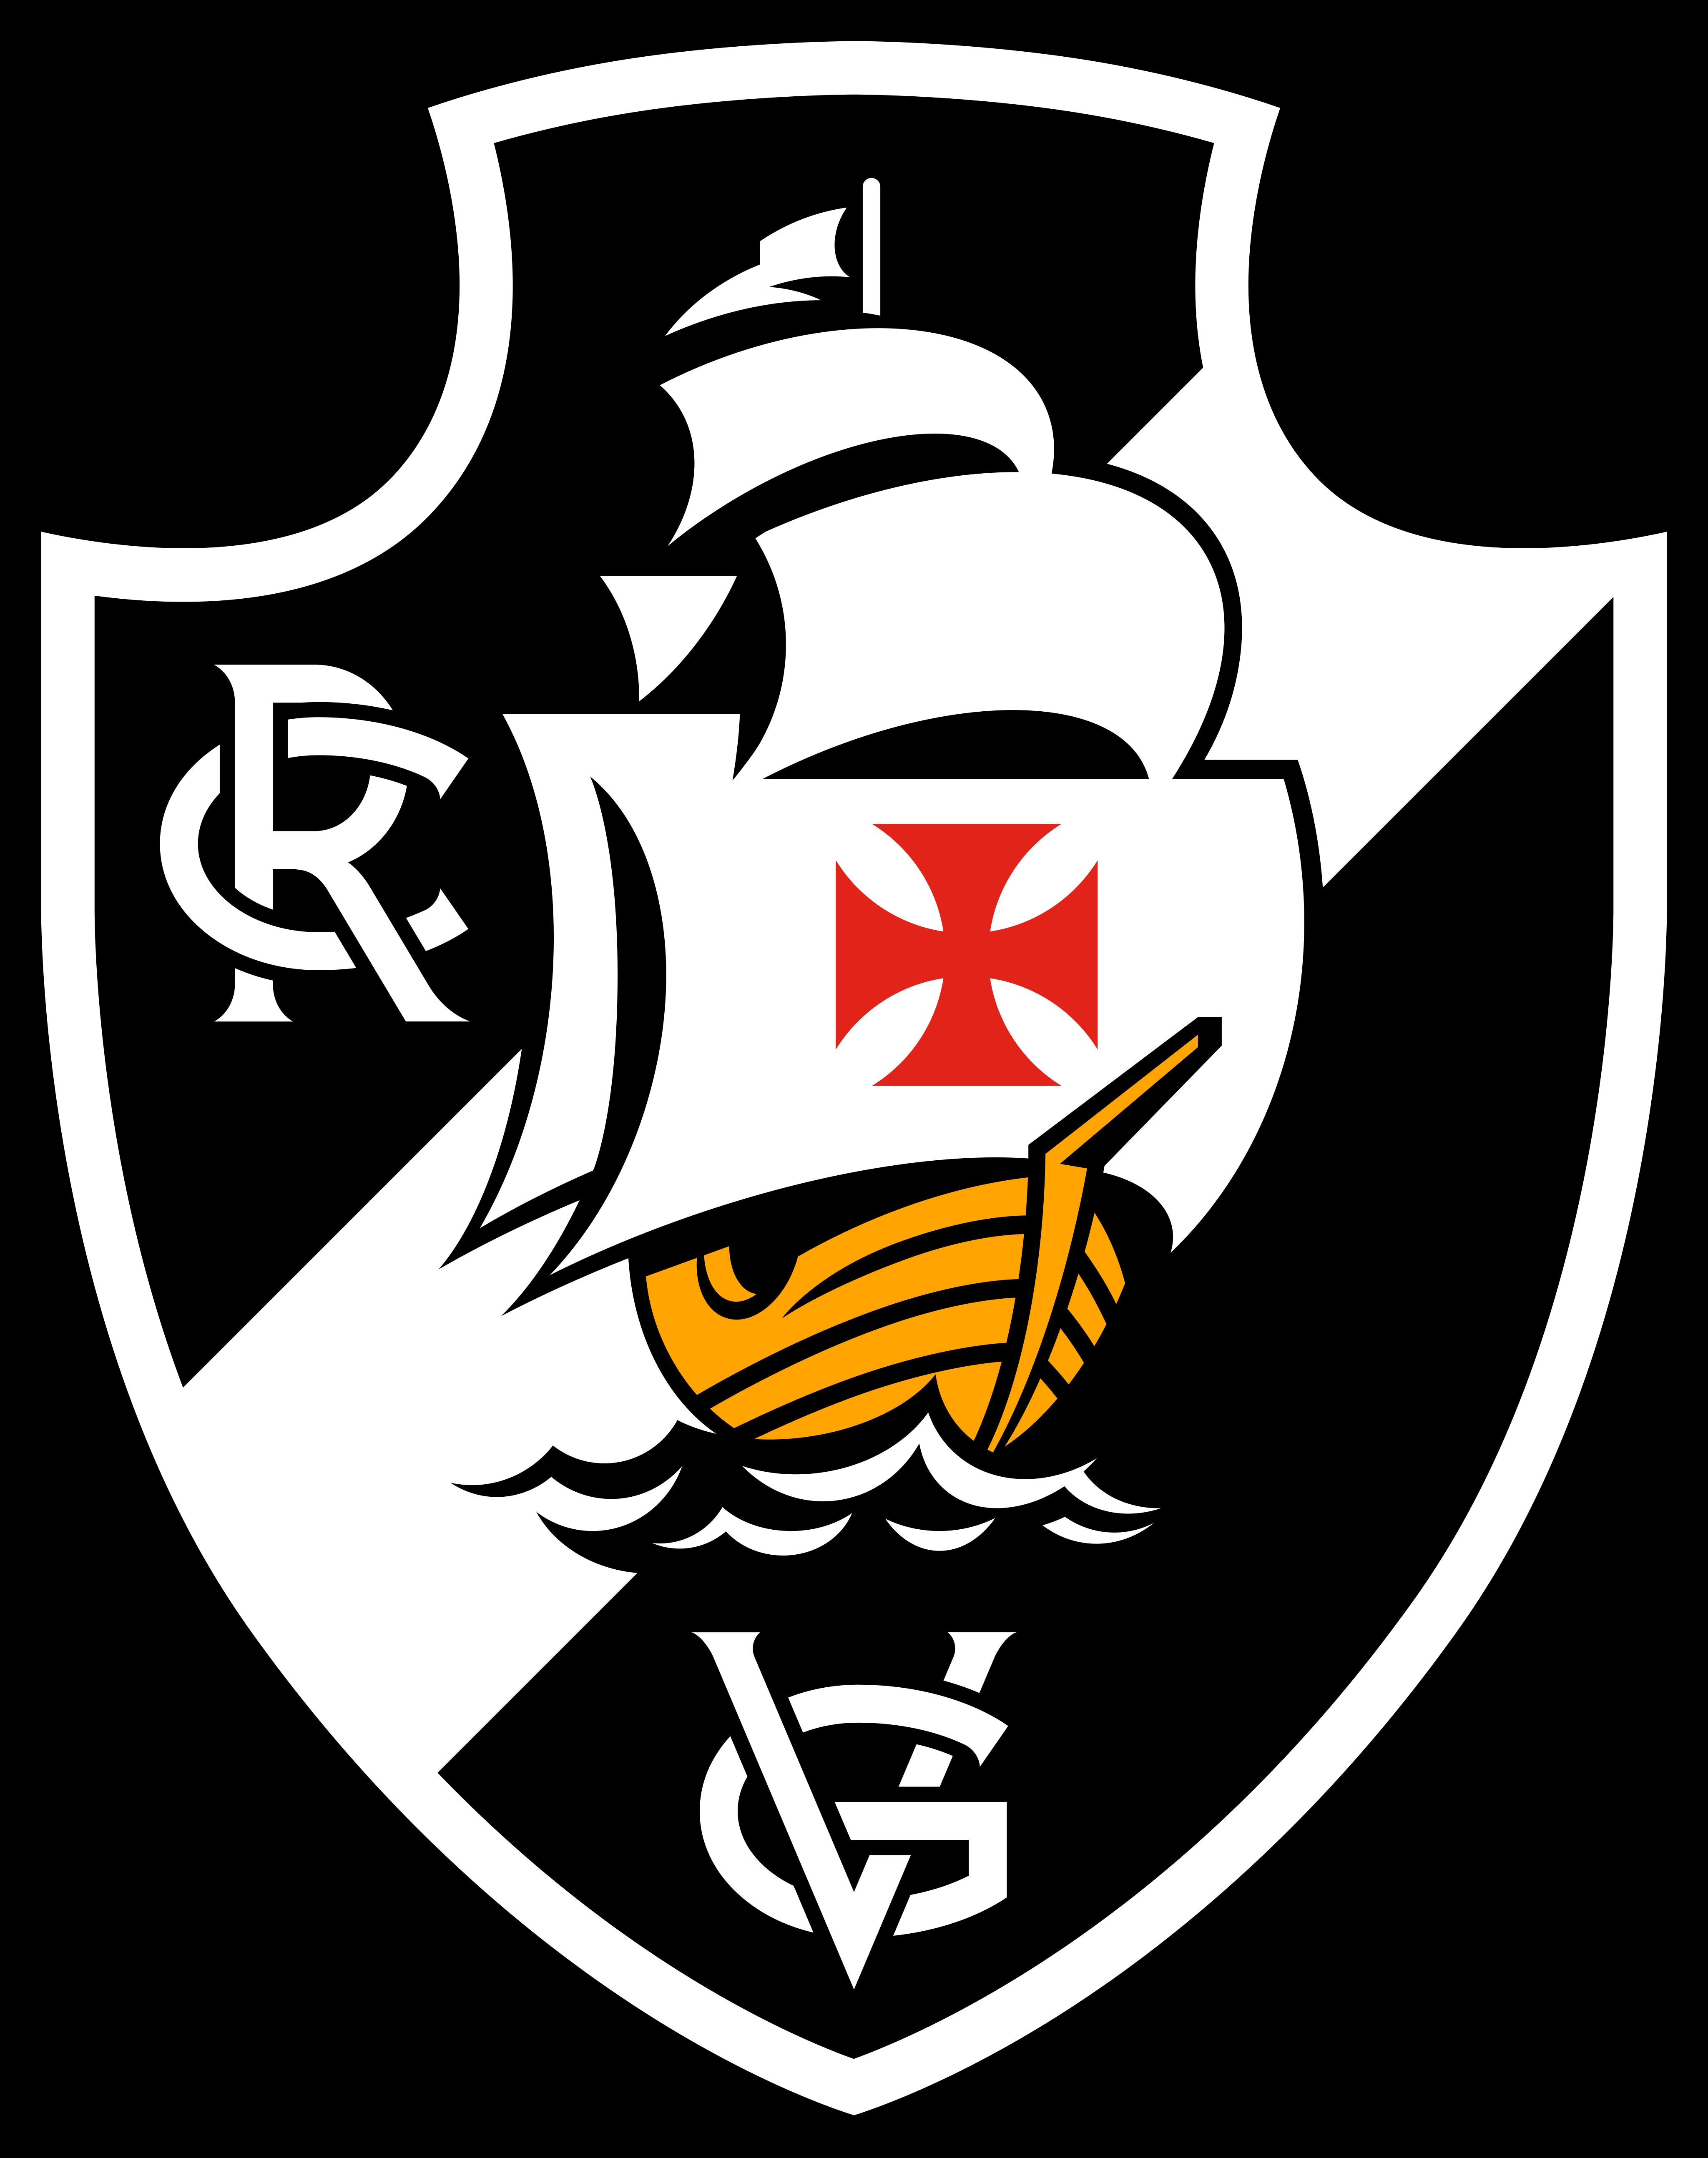 vasco logo - Vasco da Gama Logo - Escudo